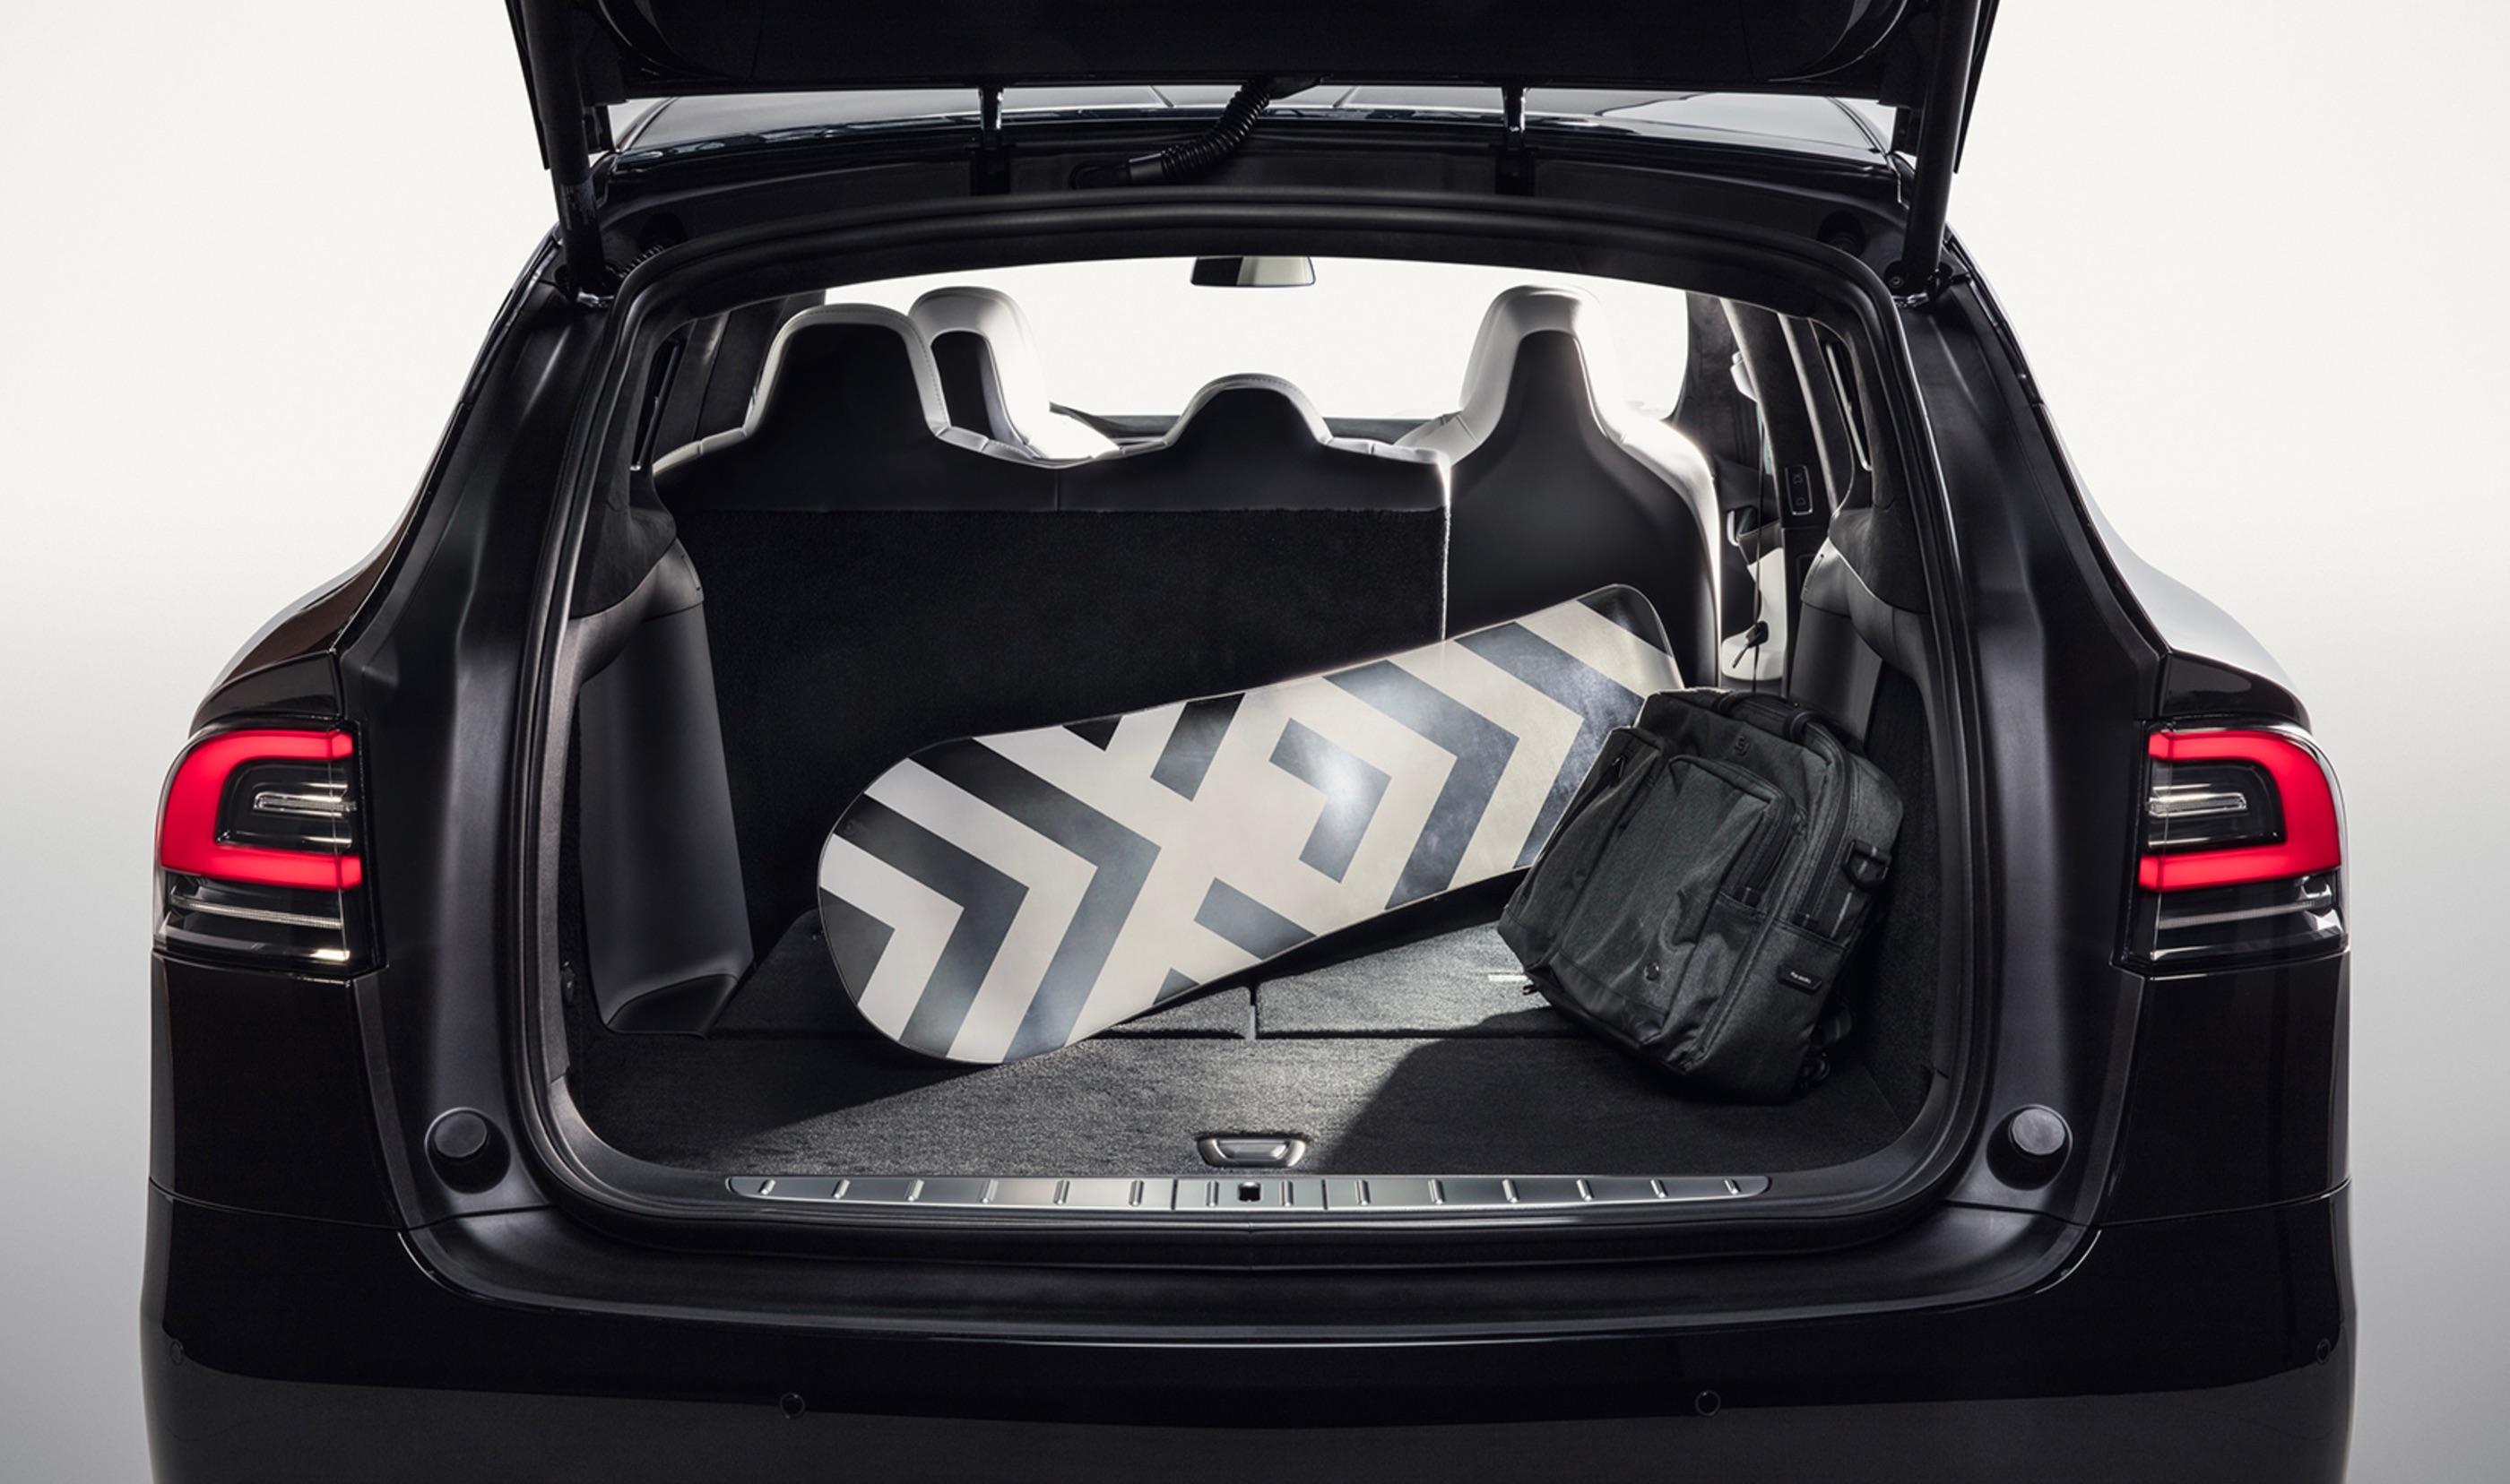 teszla-model-x-trunk-cargo-fold-down-seats